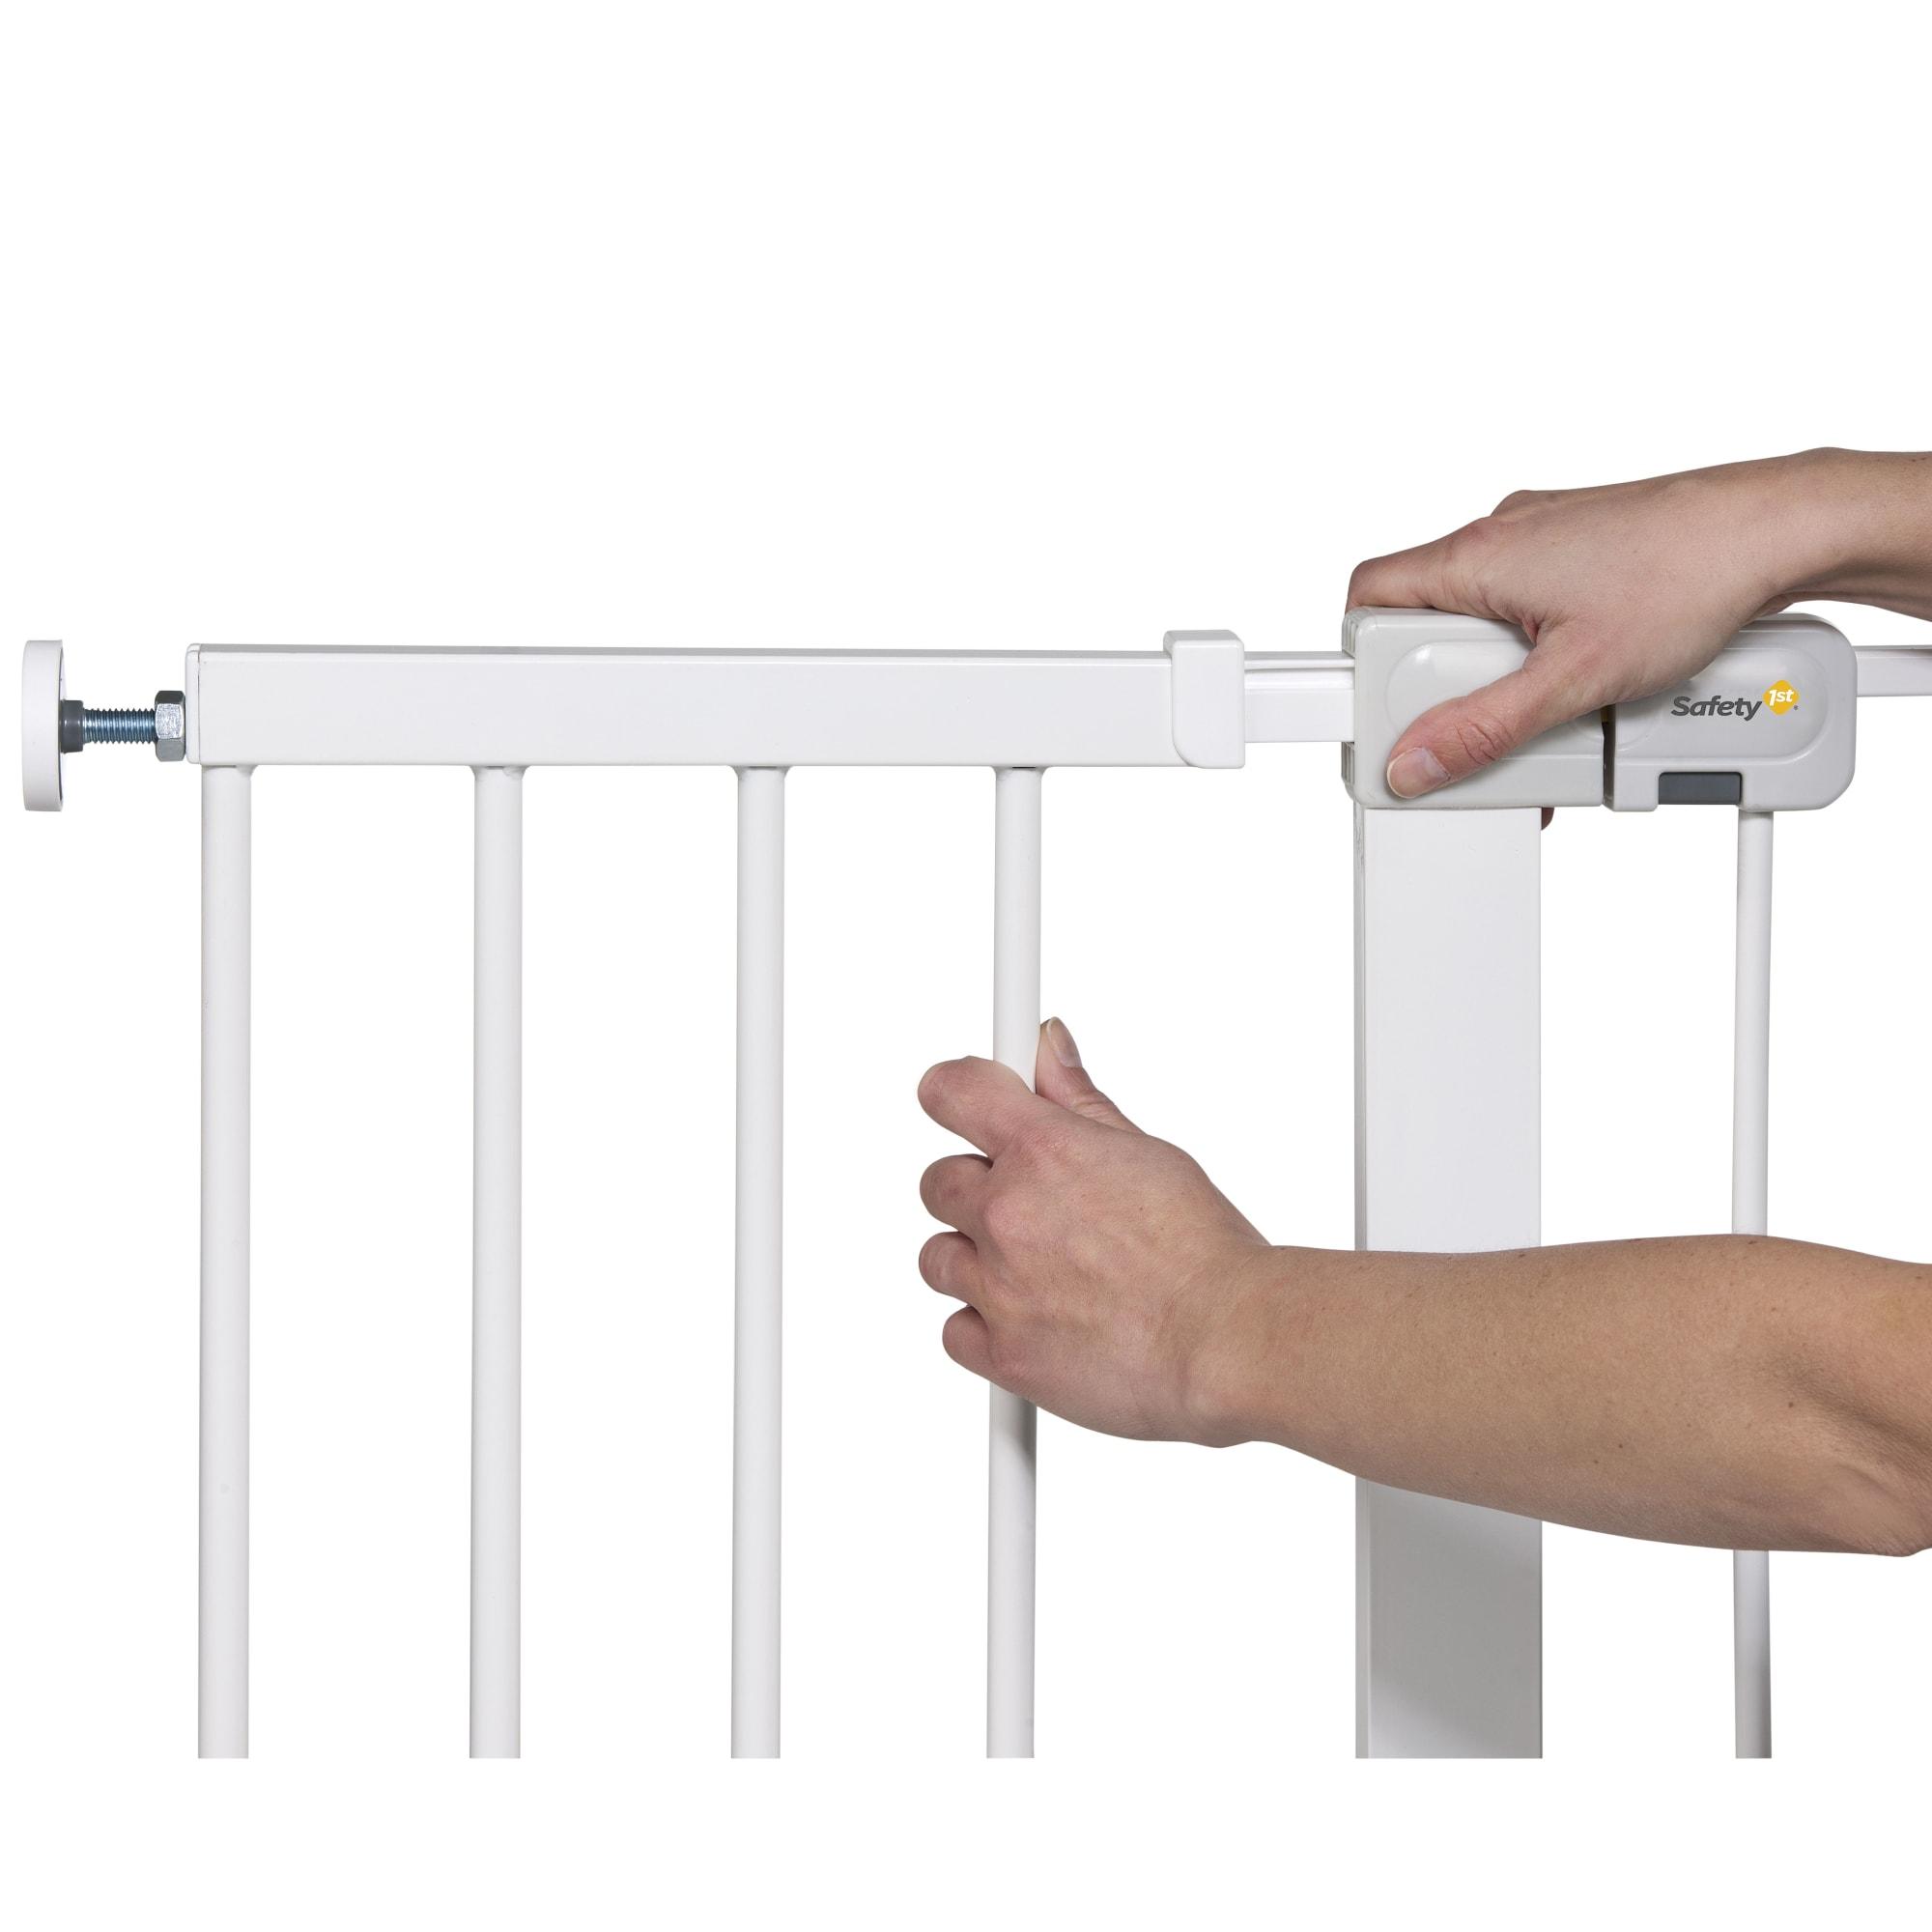 28 cm - Monteres nemt på dit Safety1st gitter